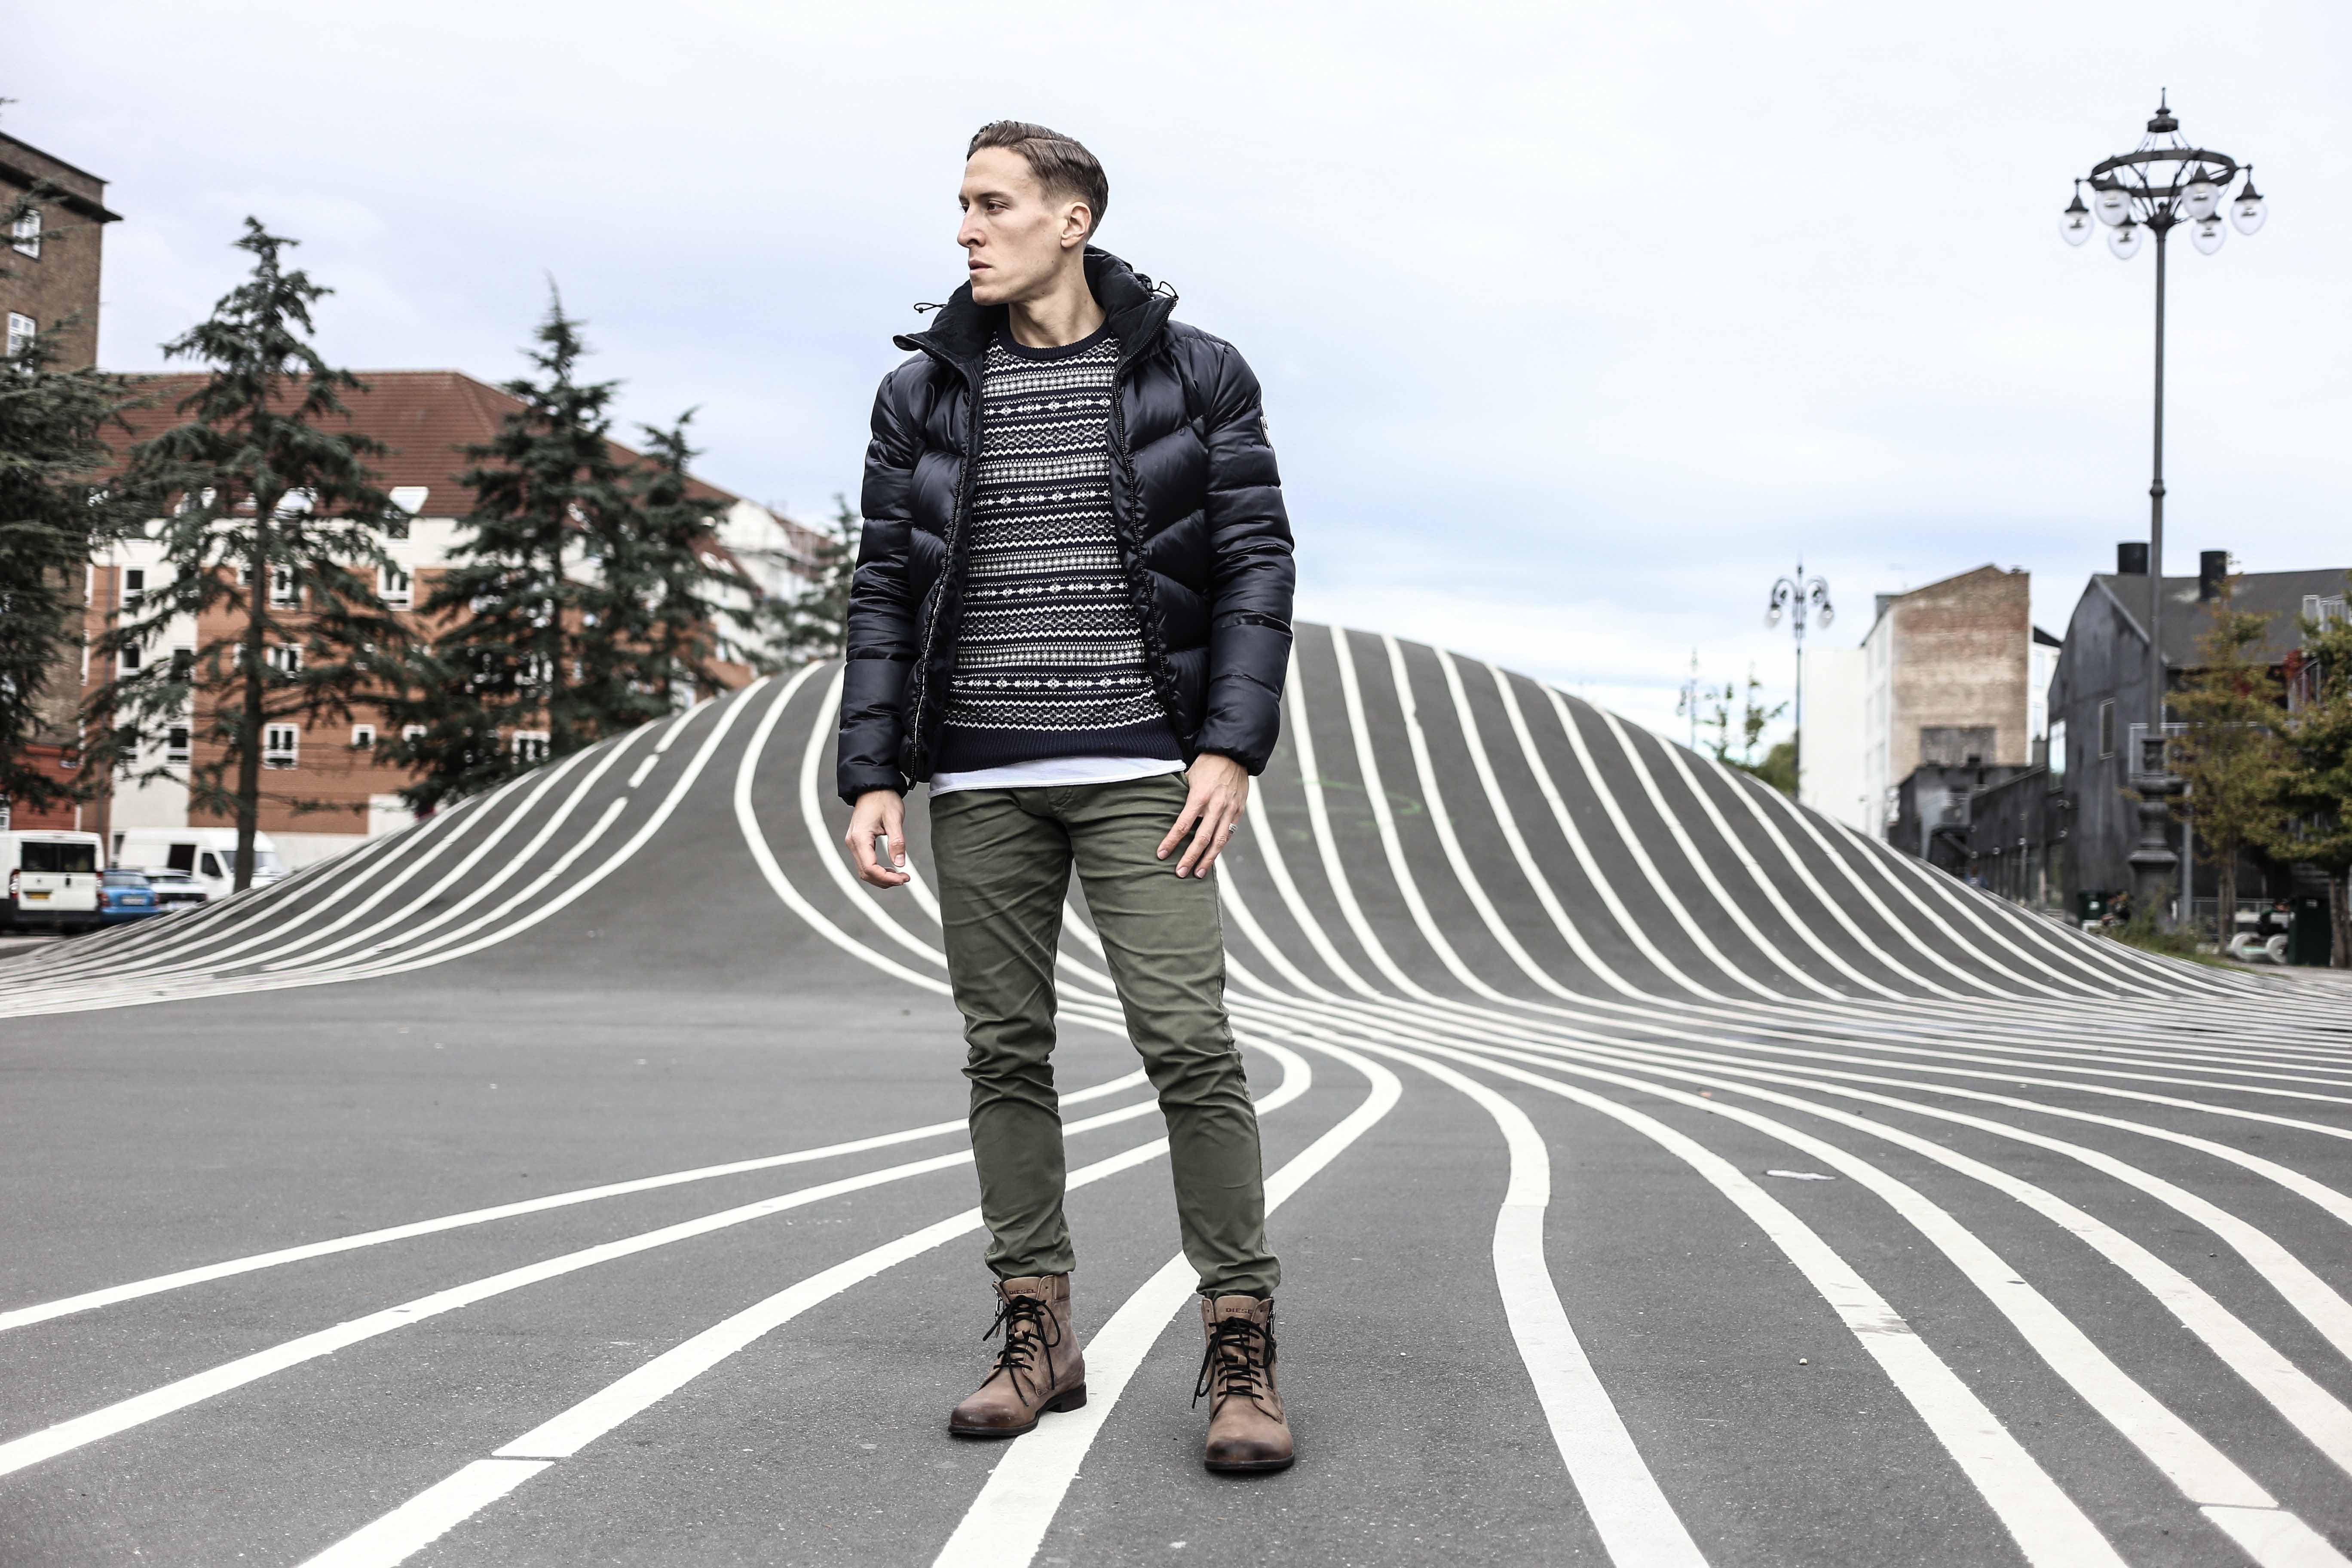 norweger-pulli-olivgruene-chino-dunkelblaue-daunenjacke-braune-lederstiefel-winter-look-menfashion-modeblog-berlin_4536